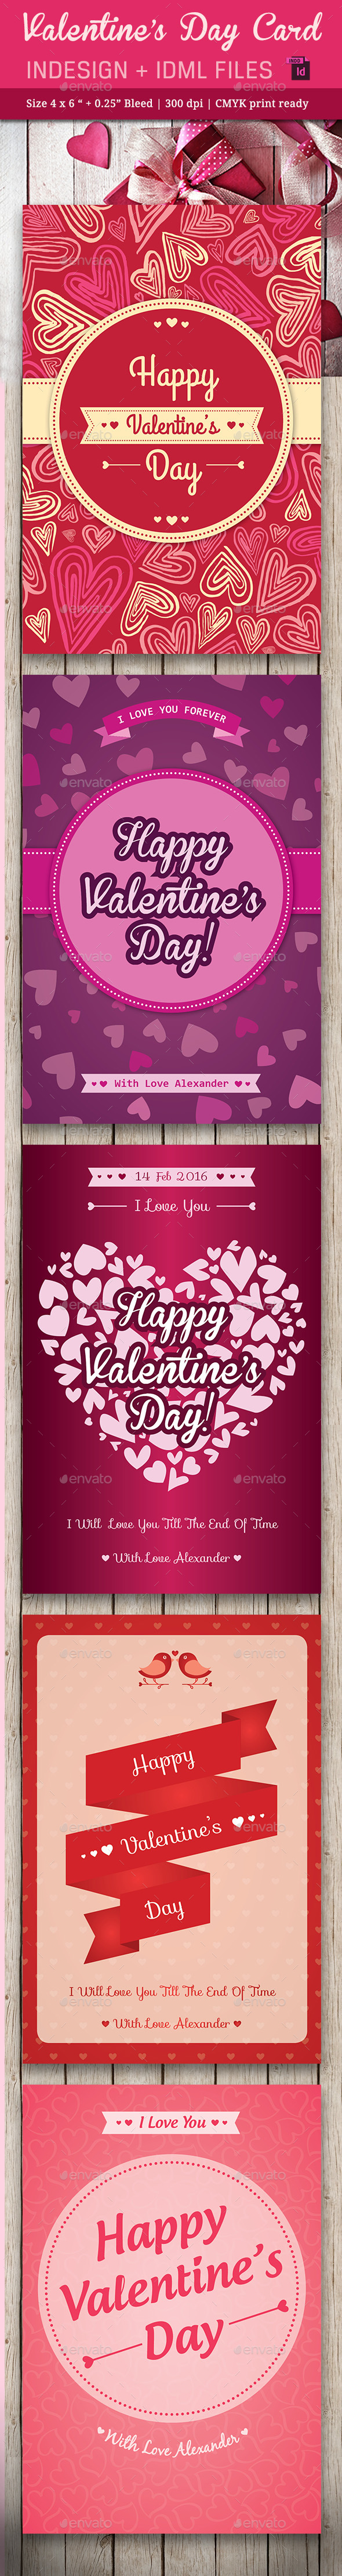 Valentine's Day Card Vol. 2 - Cards & Invites Print Templates